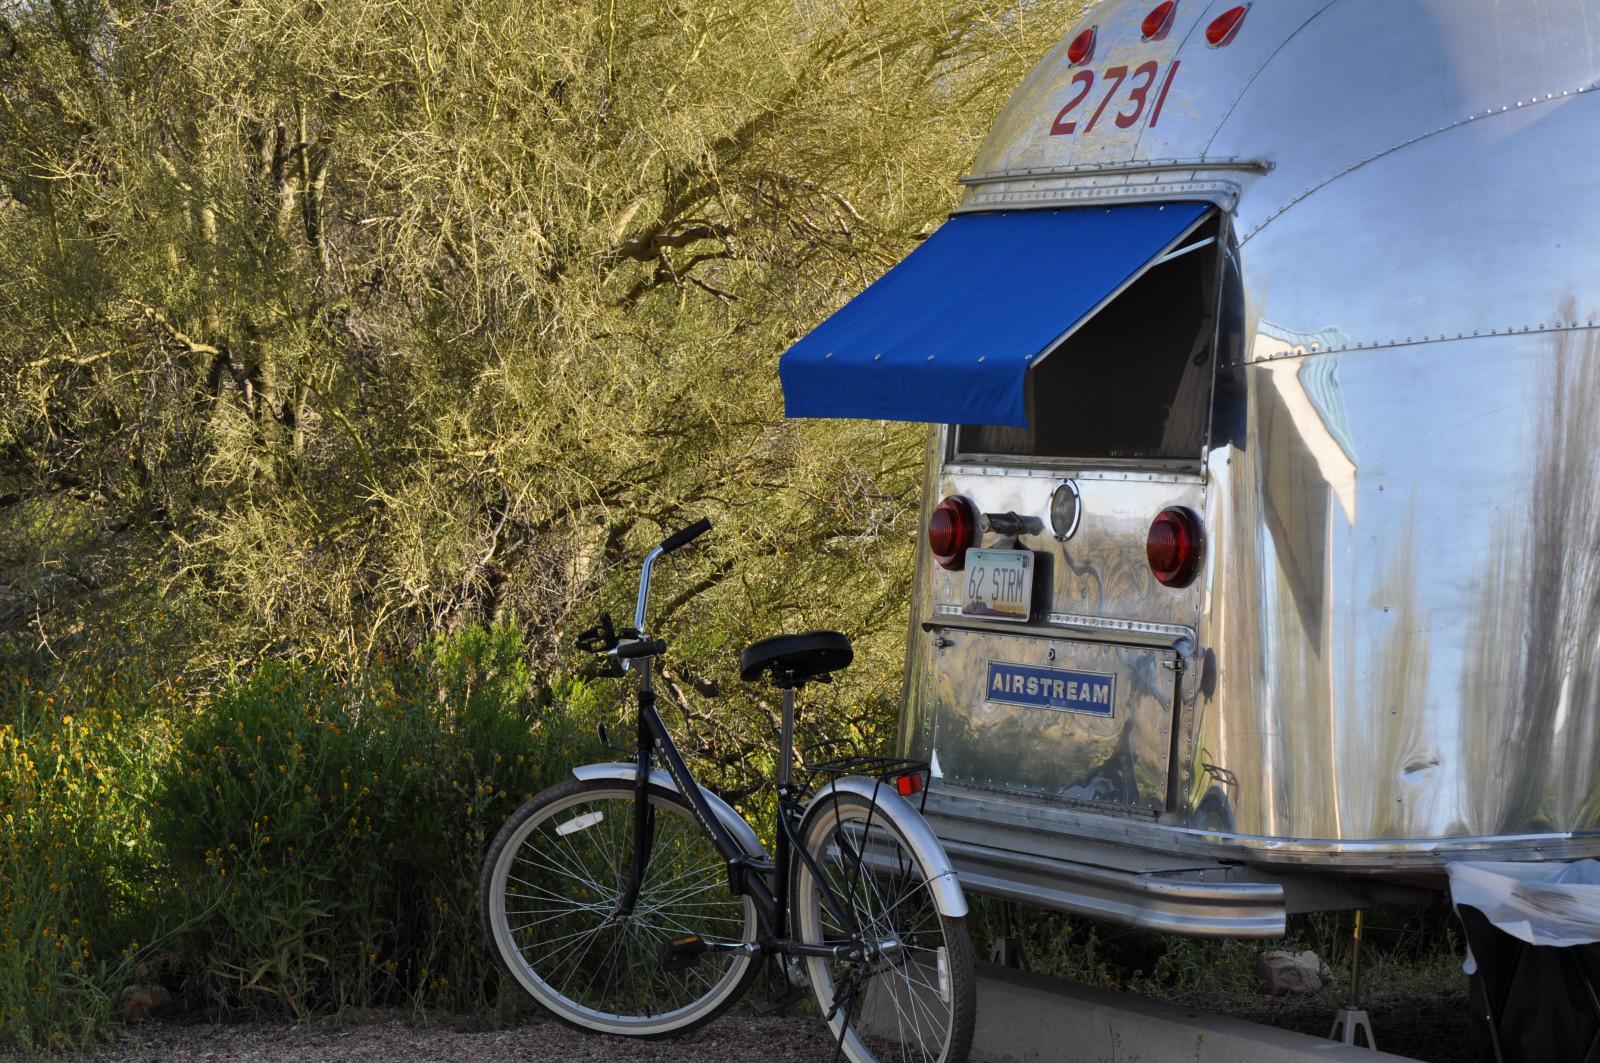 Click image for larger version  Name:Roosevelt Lake Camping 03-10 033_01.JPG Views:71 Size:771.9 KB ID:99086